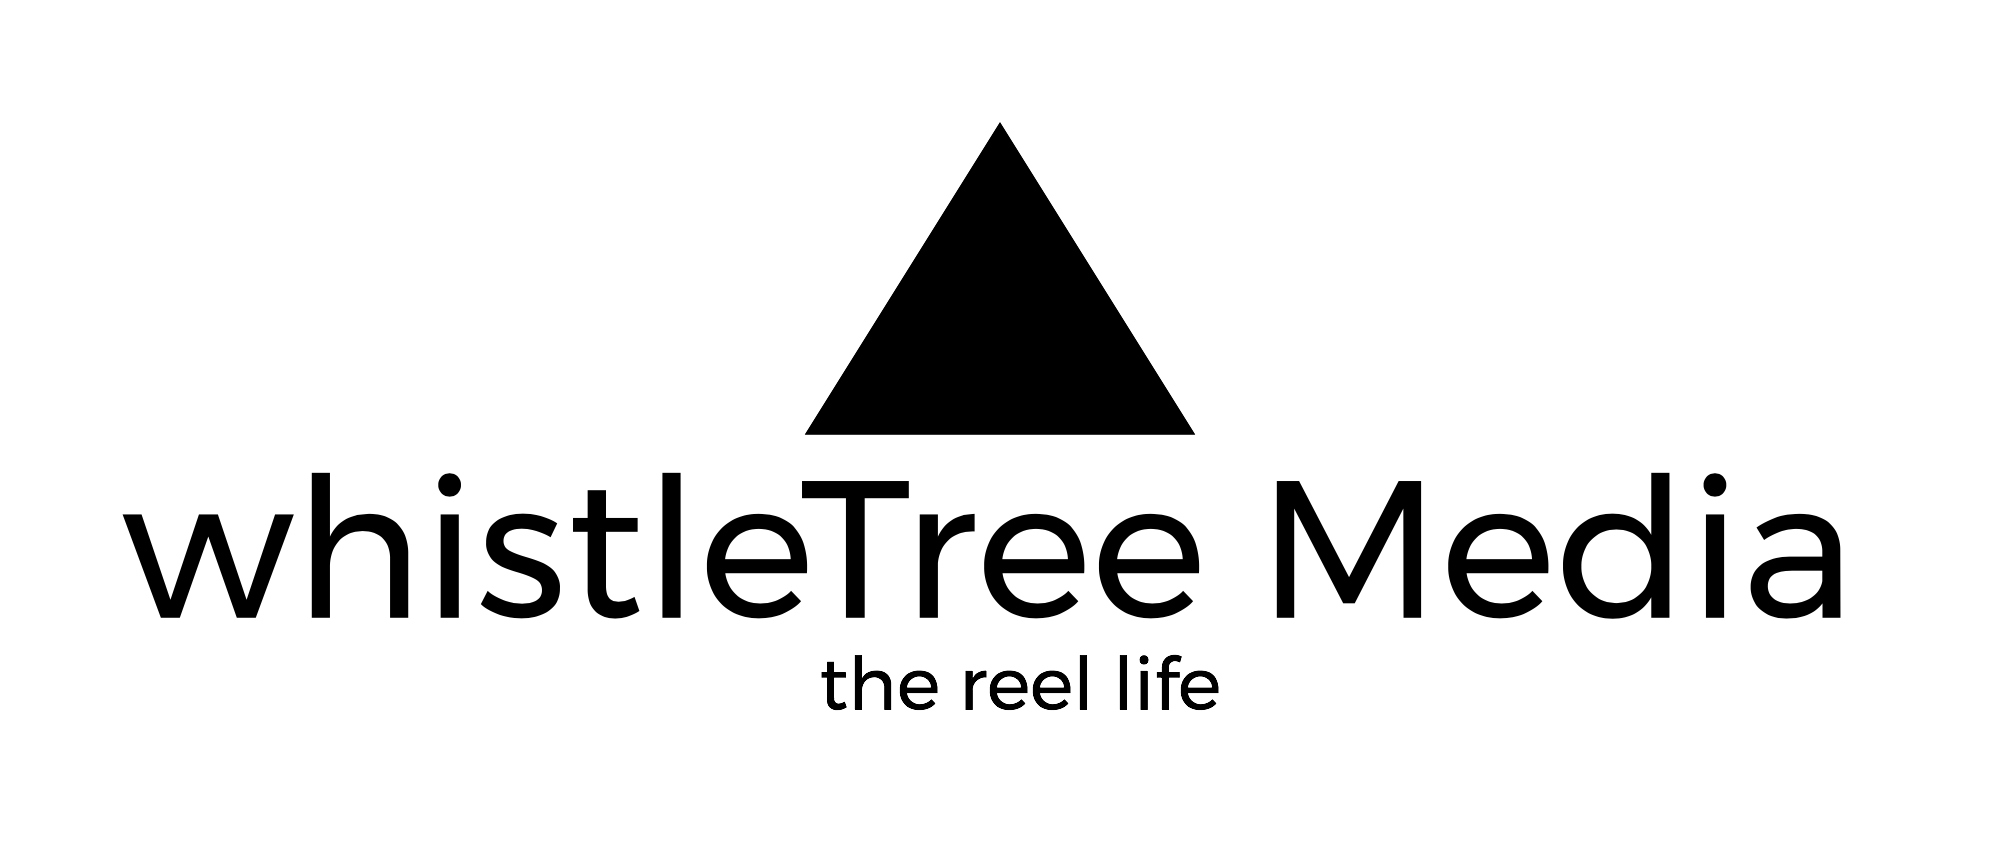 whistletree-logo3.png